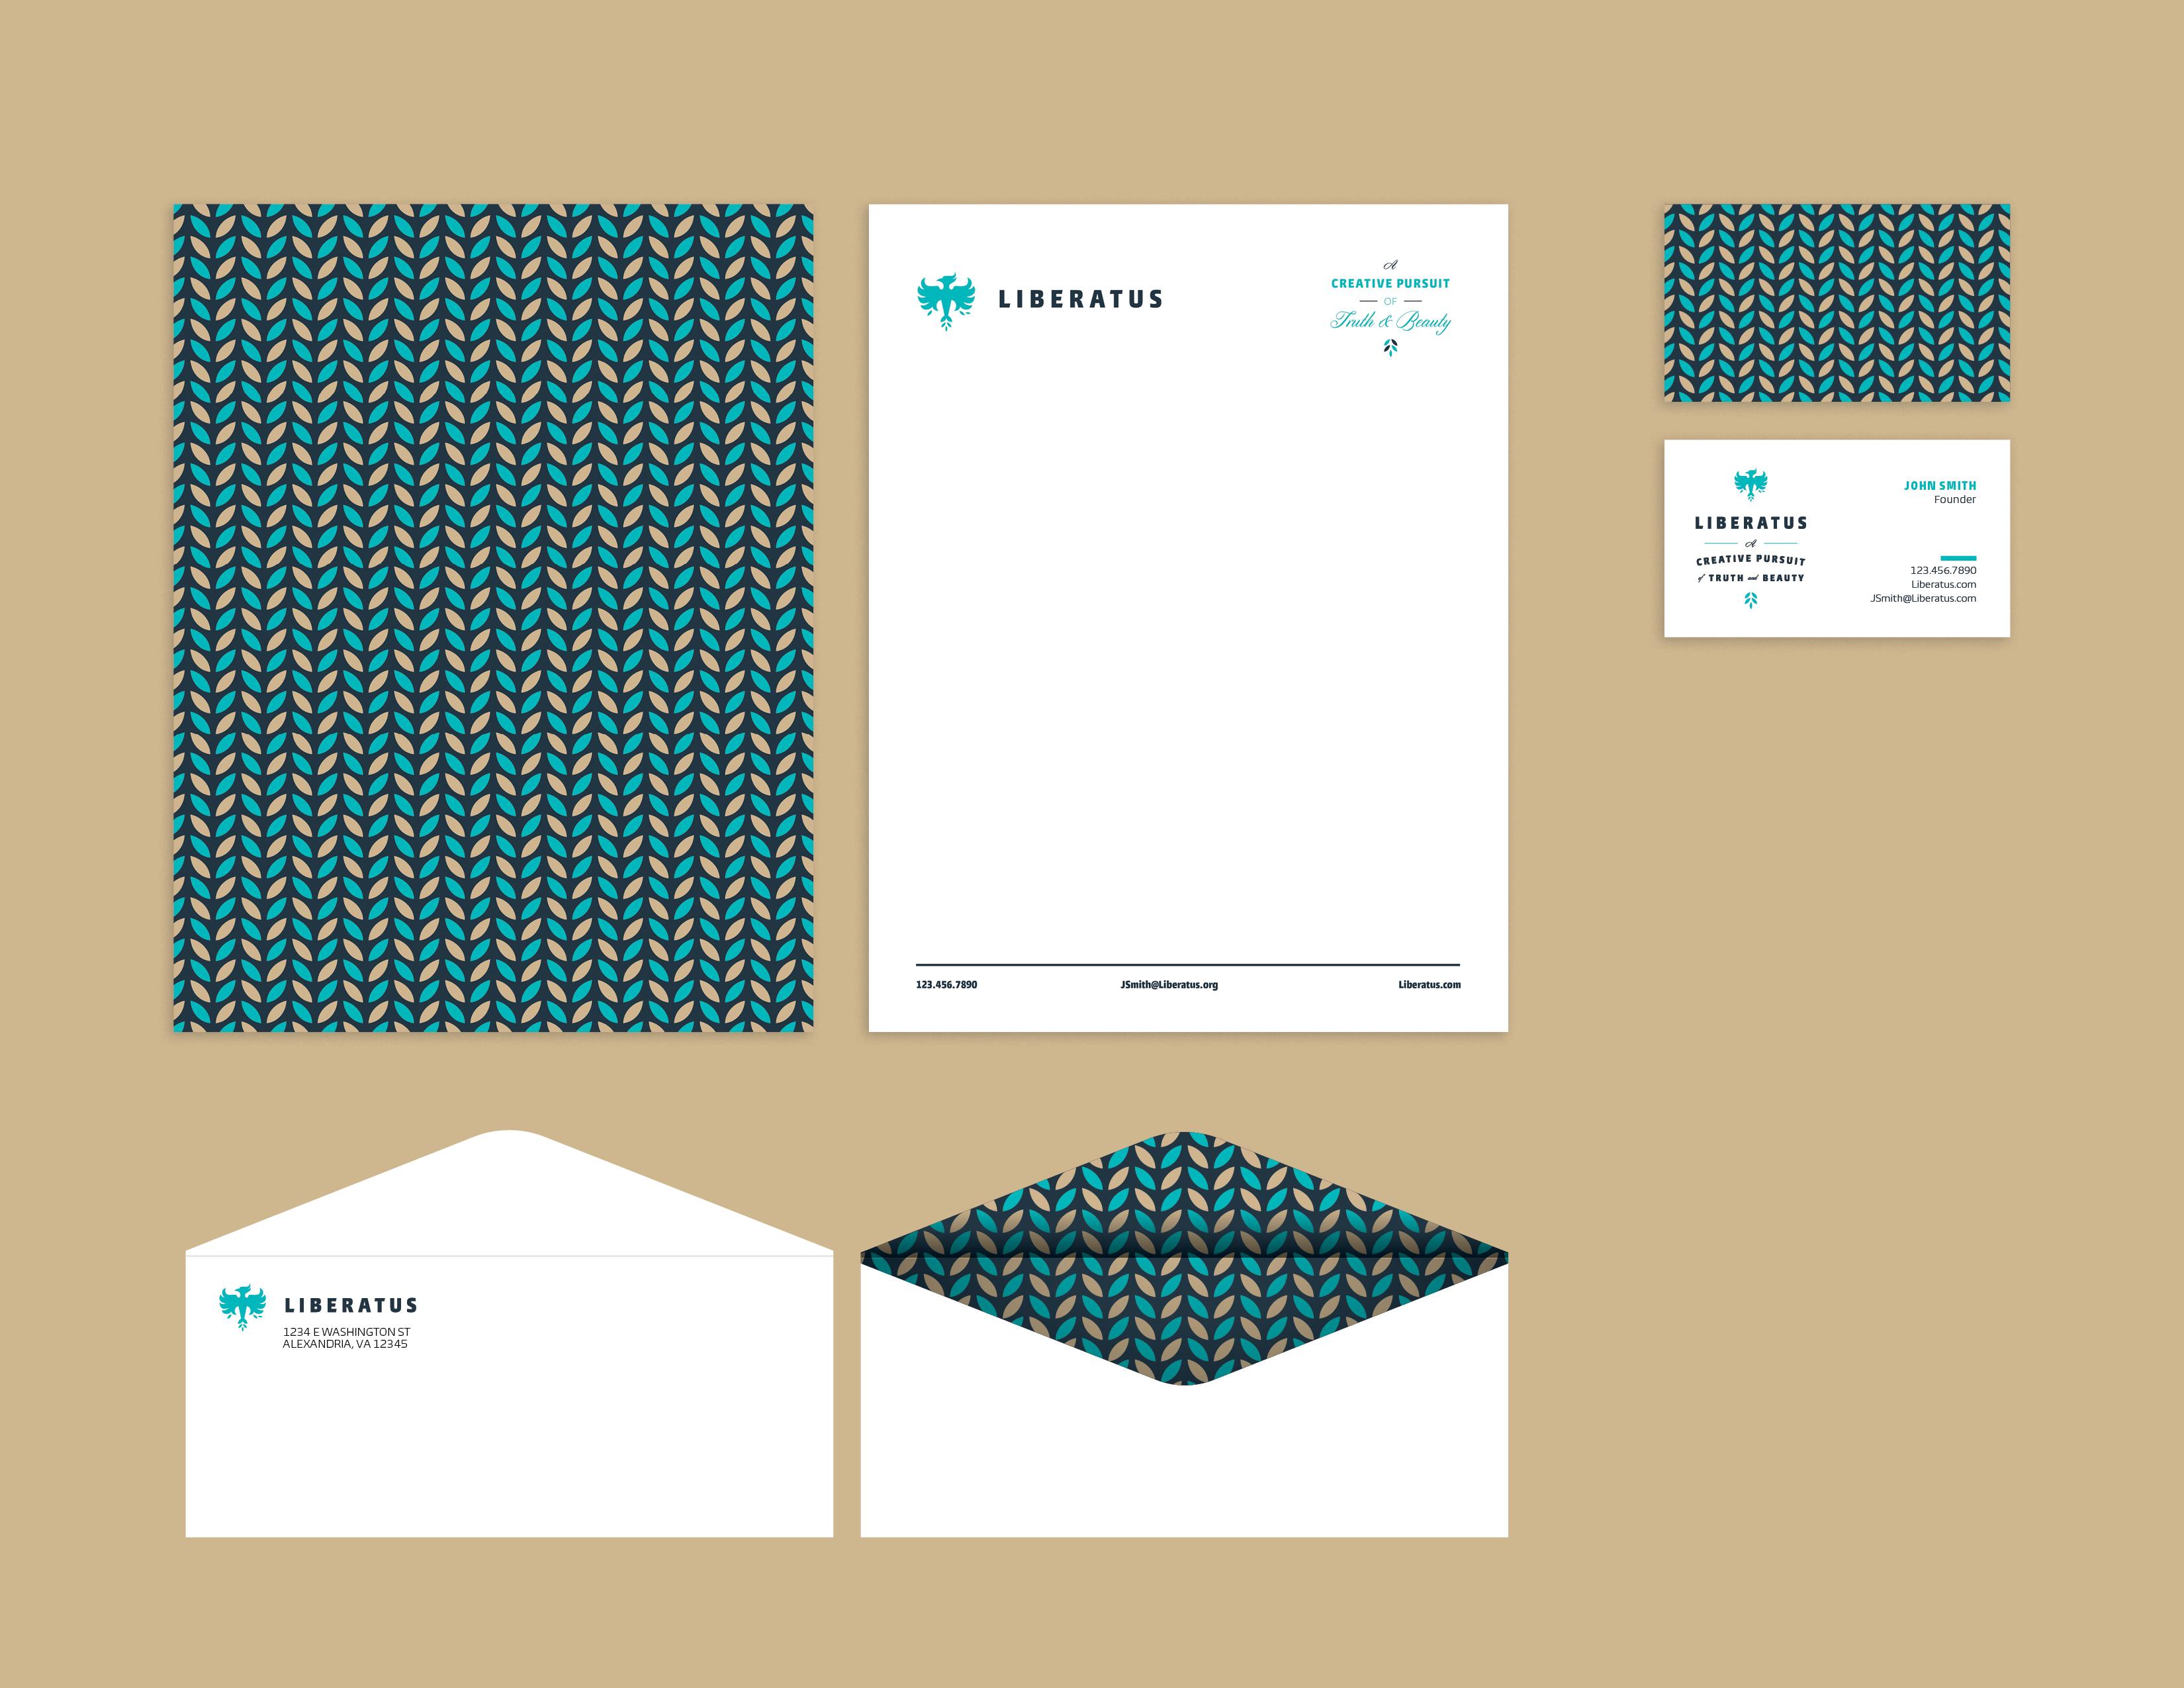 Liberatus branding presentation